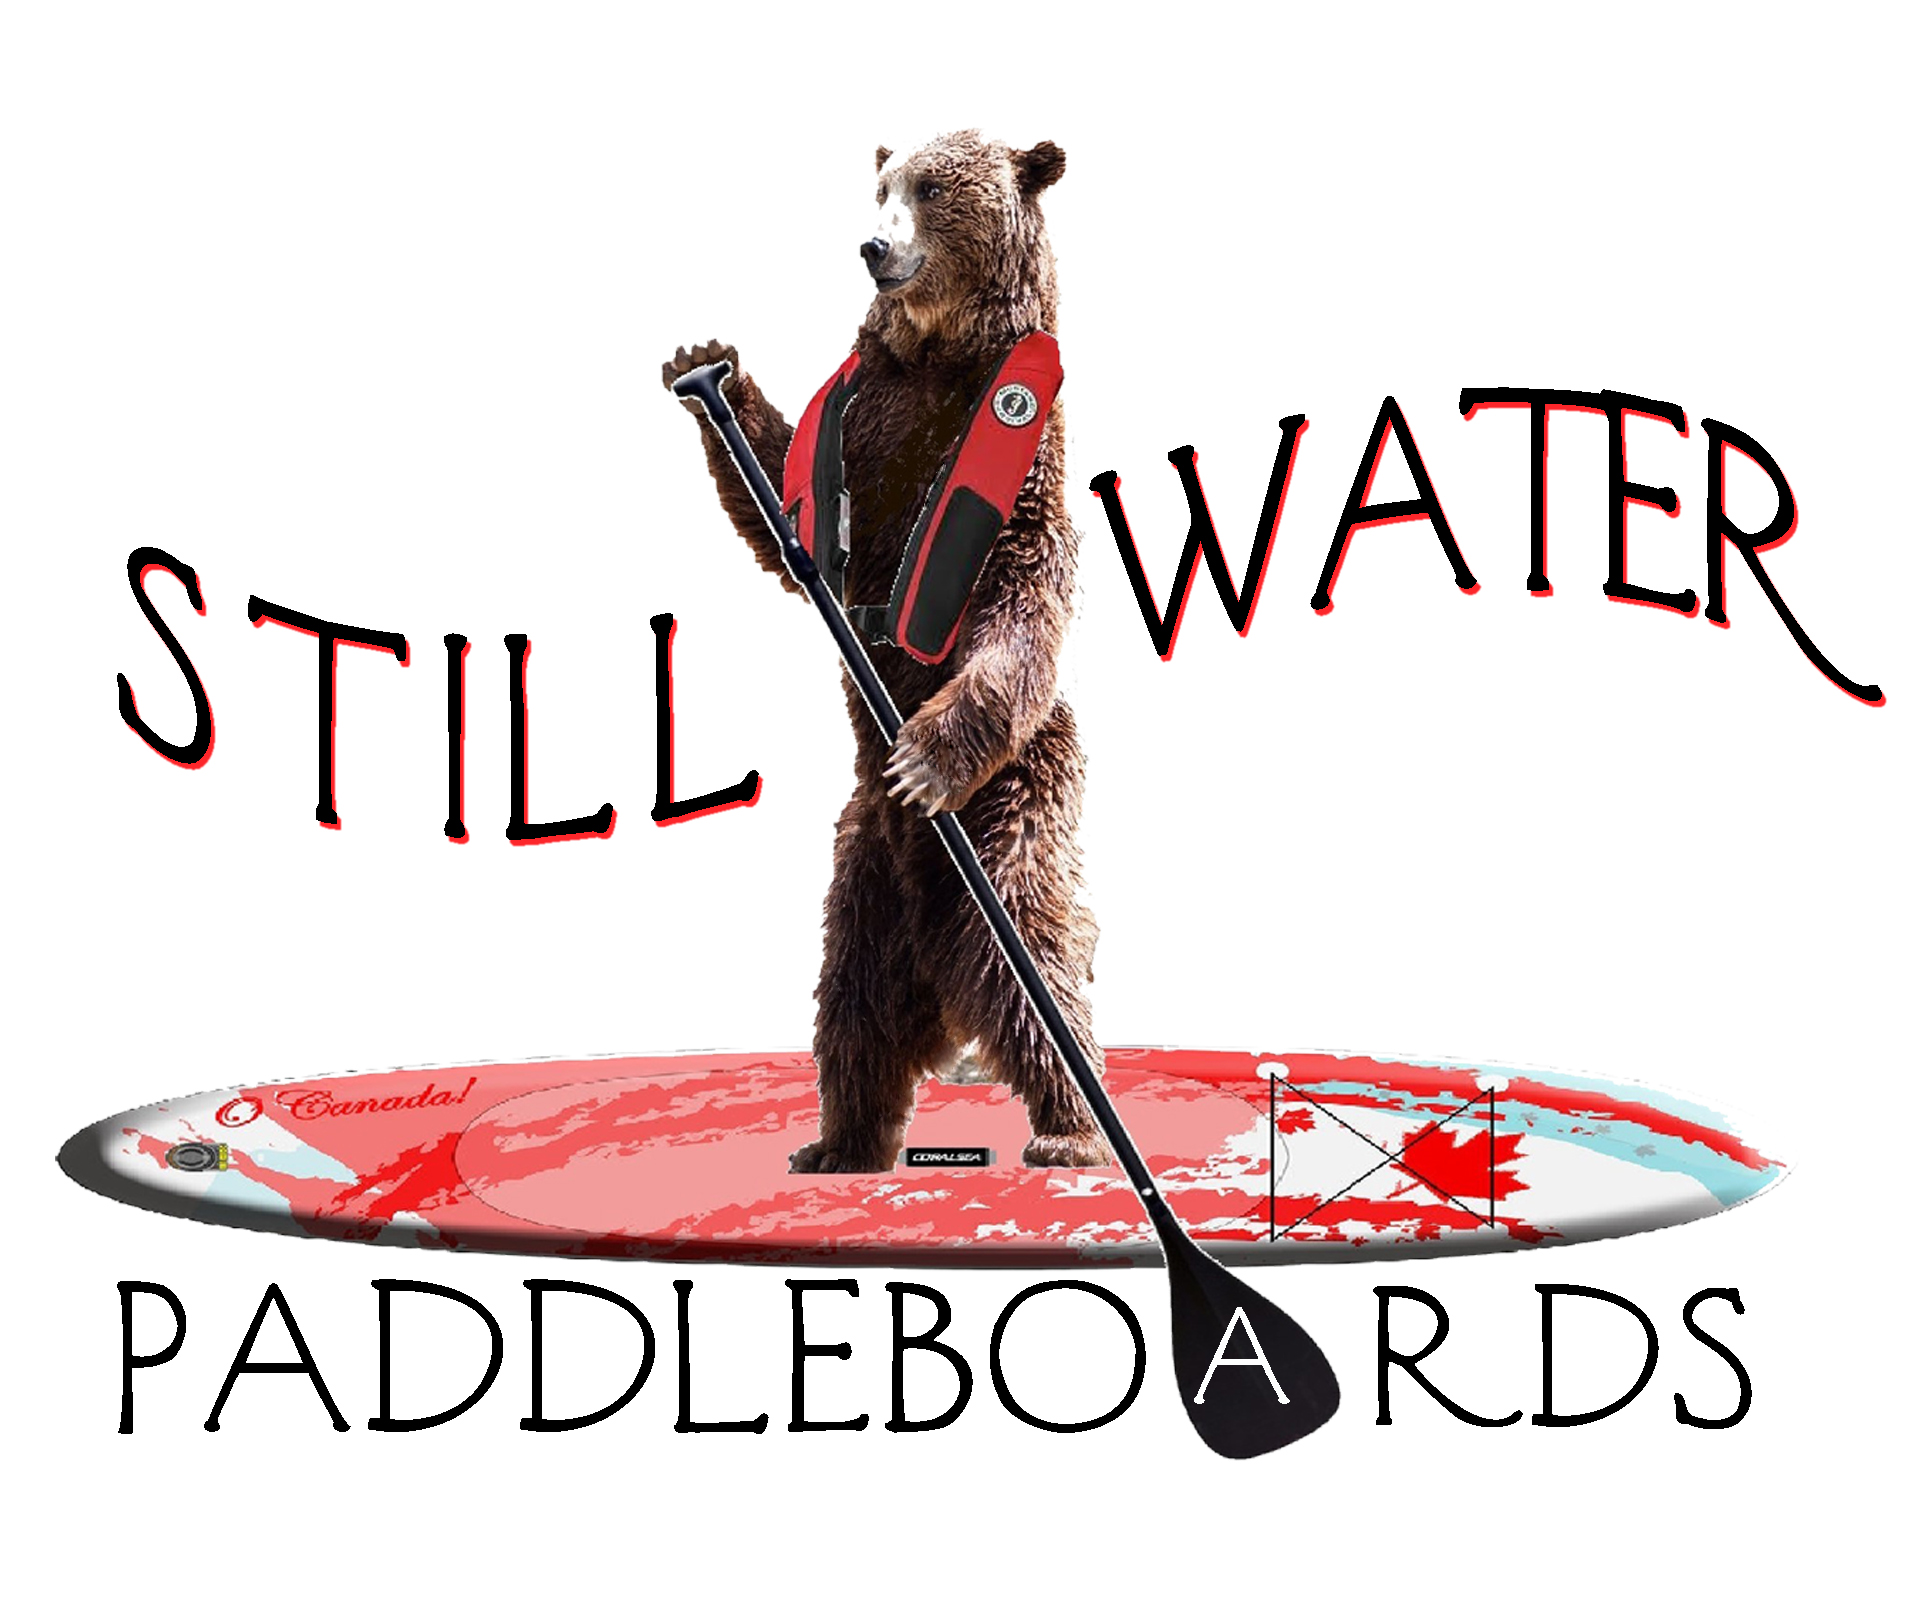 Stillwater Paddleboards